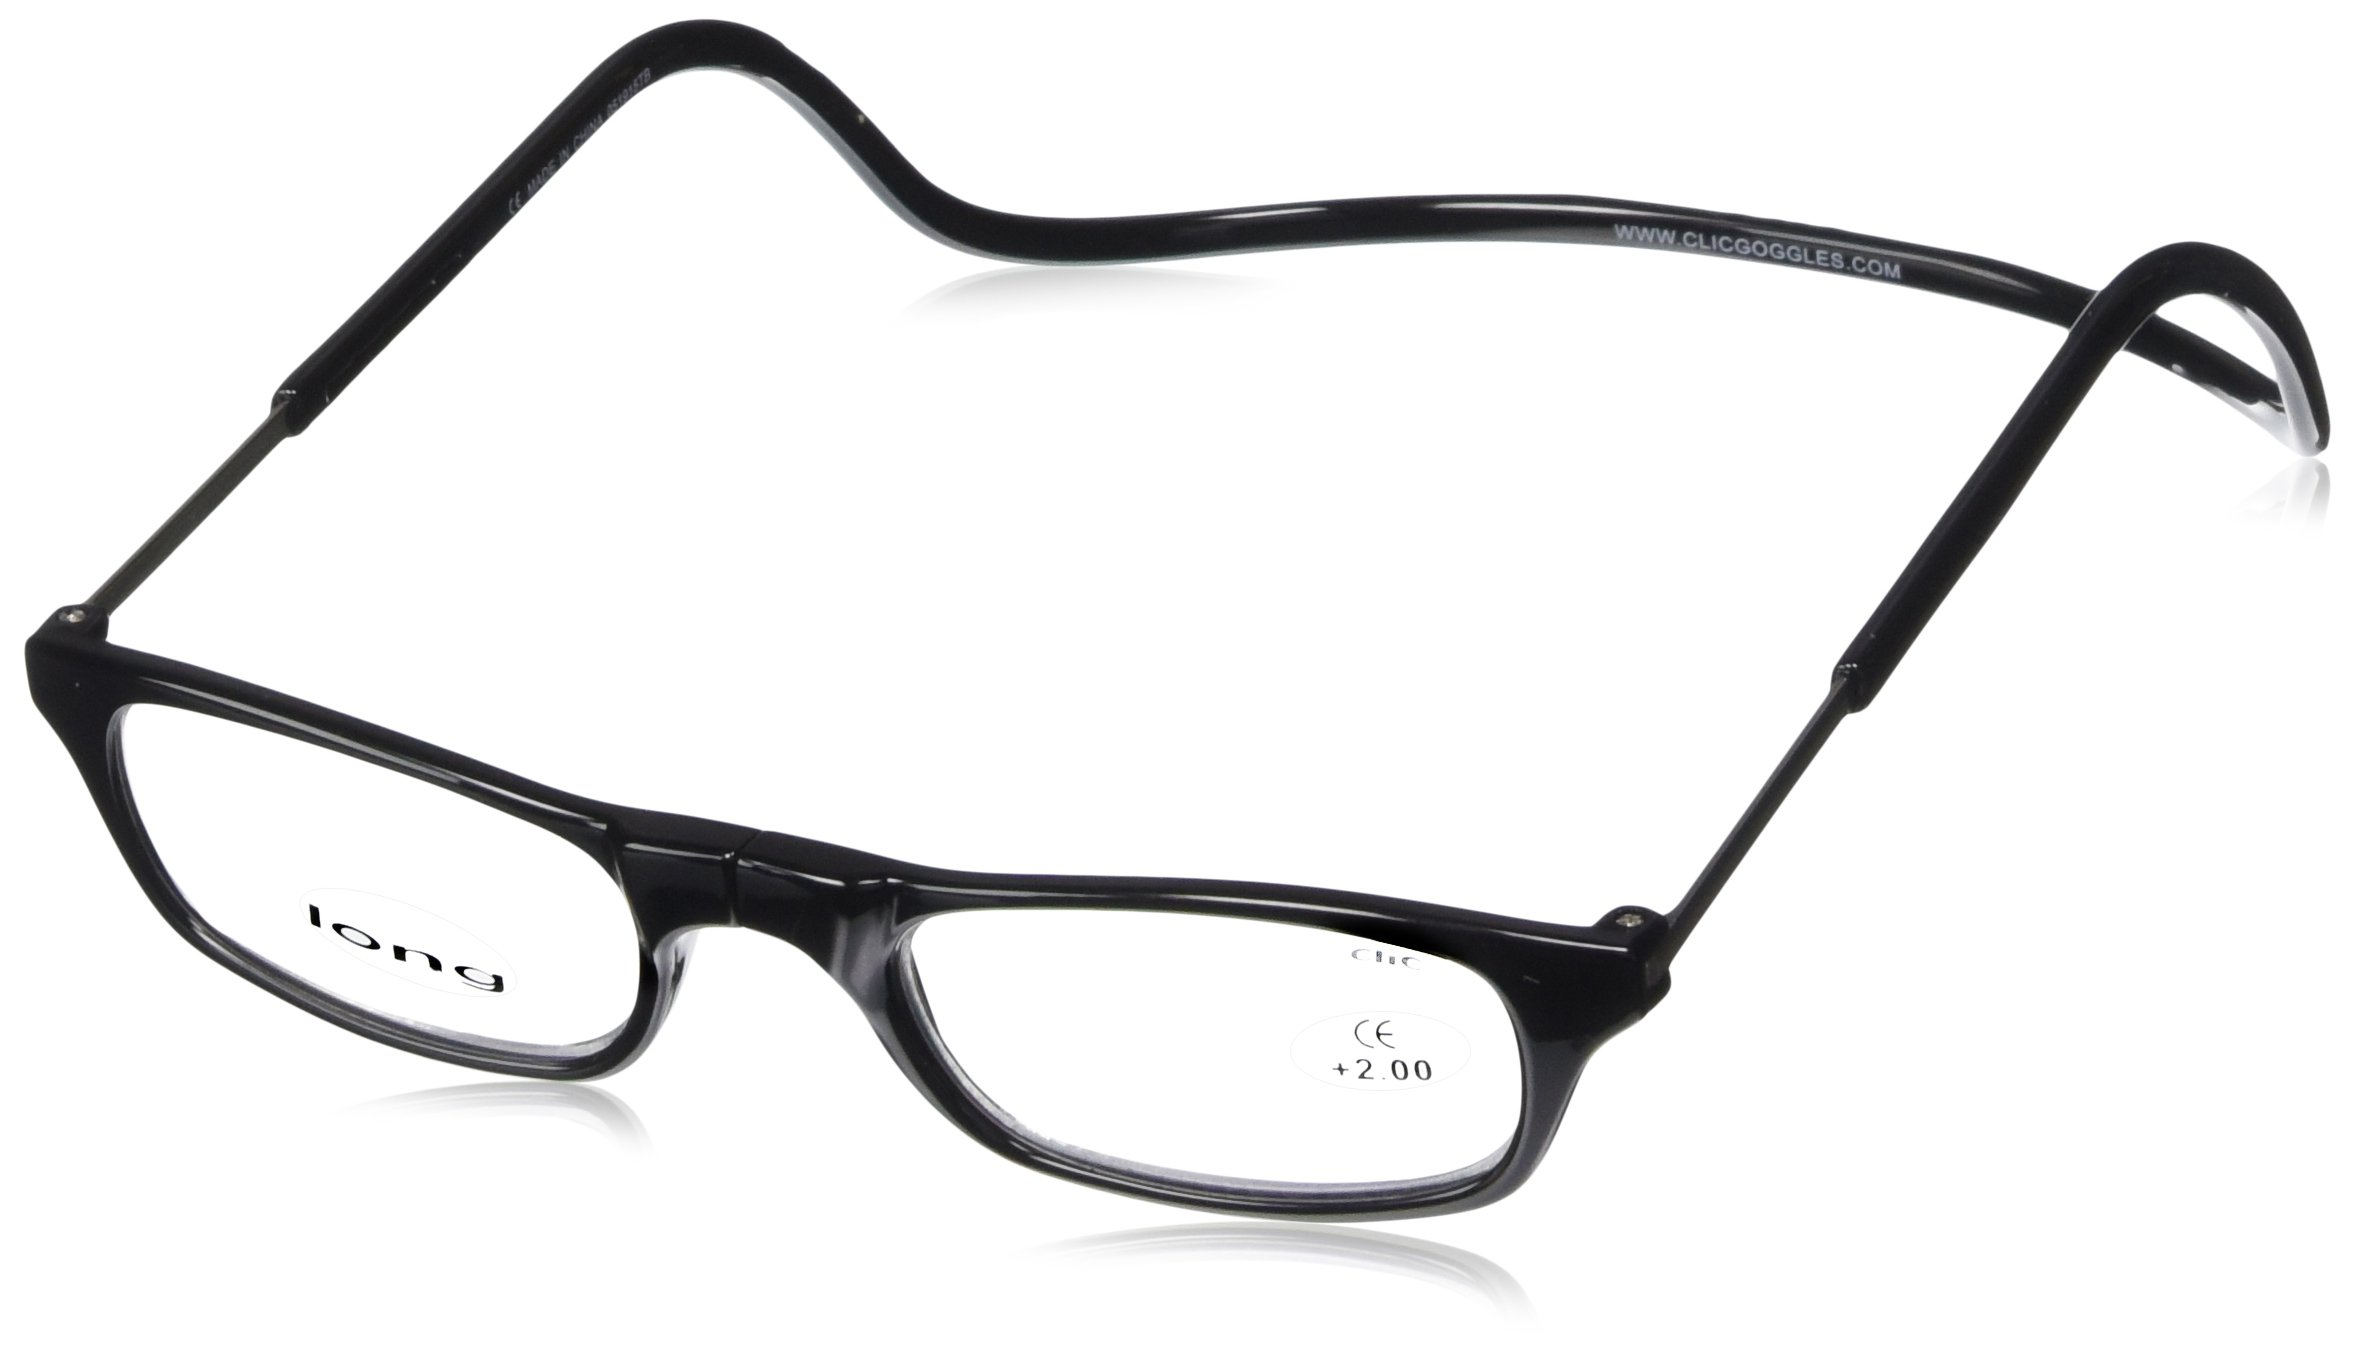 2273ec671e4 Get Quotations · Clic Magnetic Reading Glasses